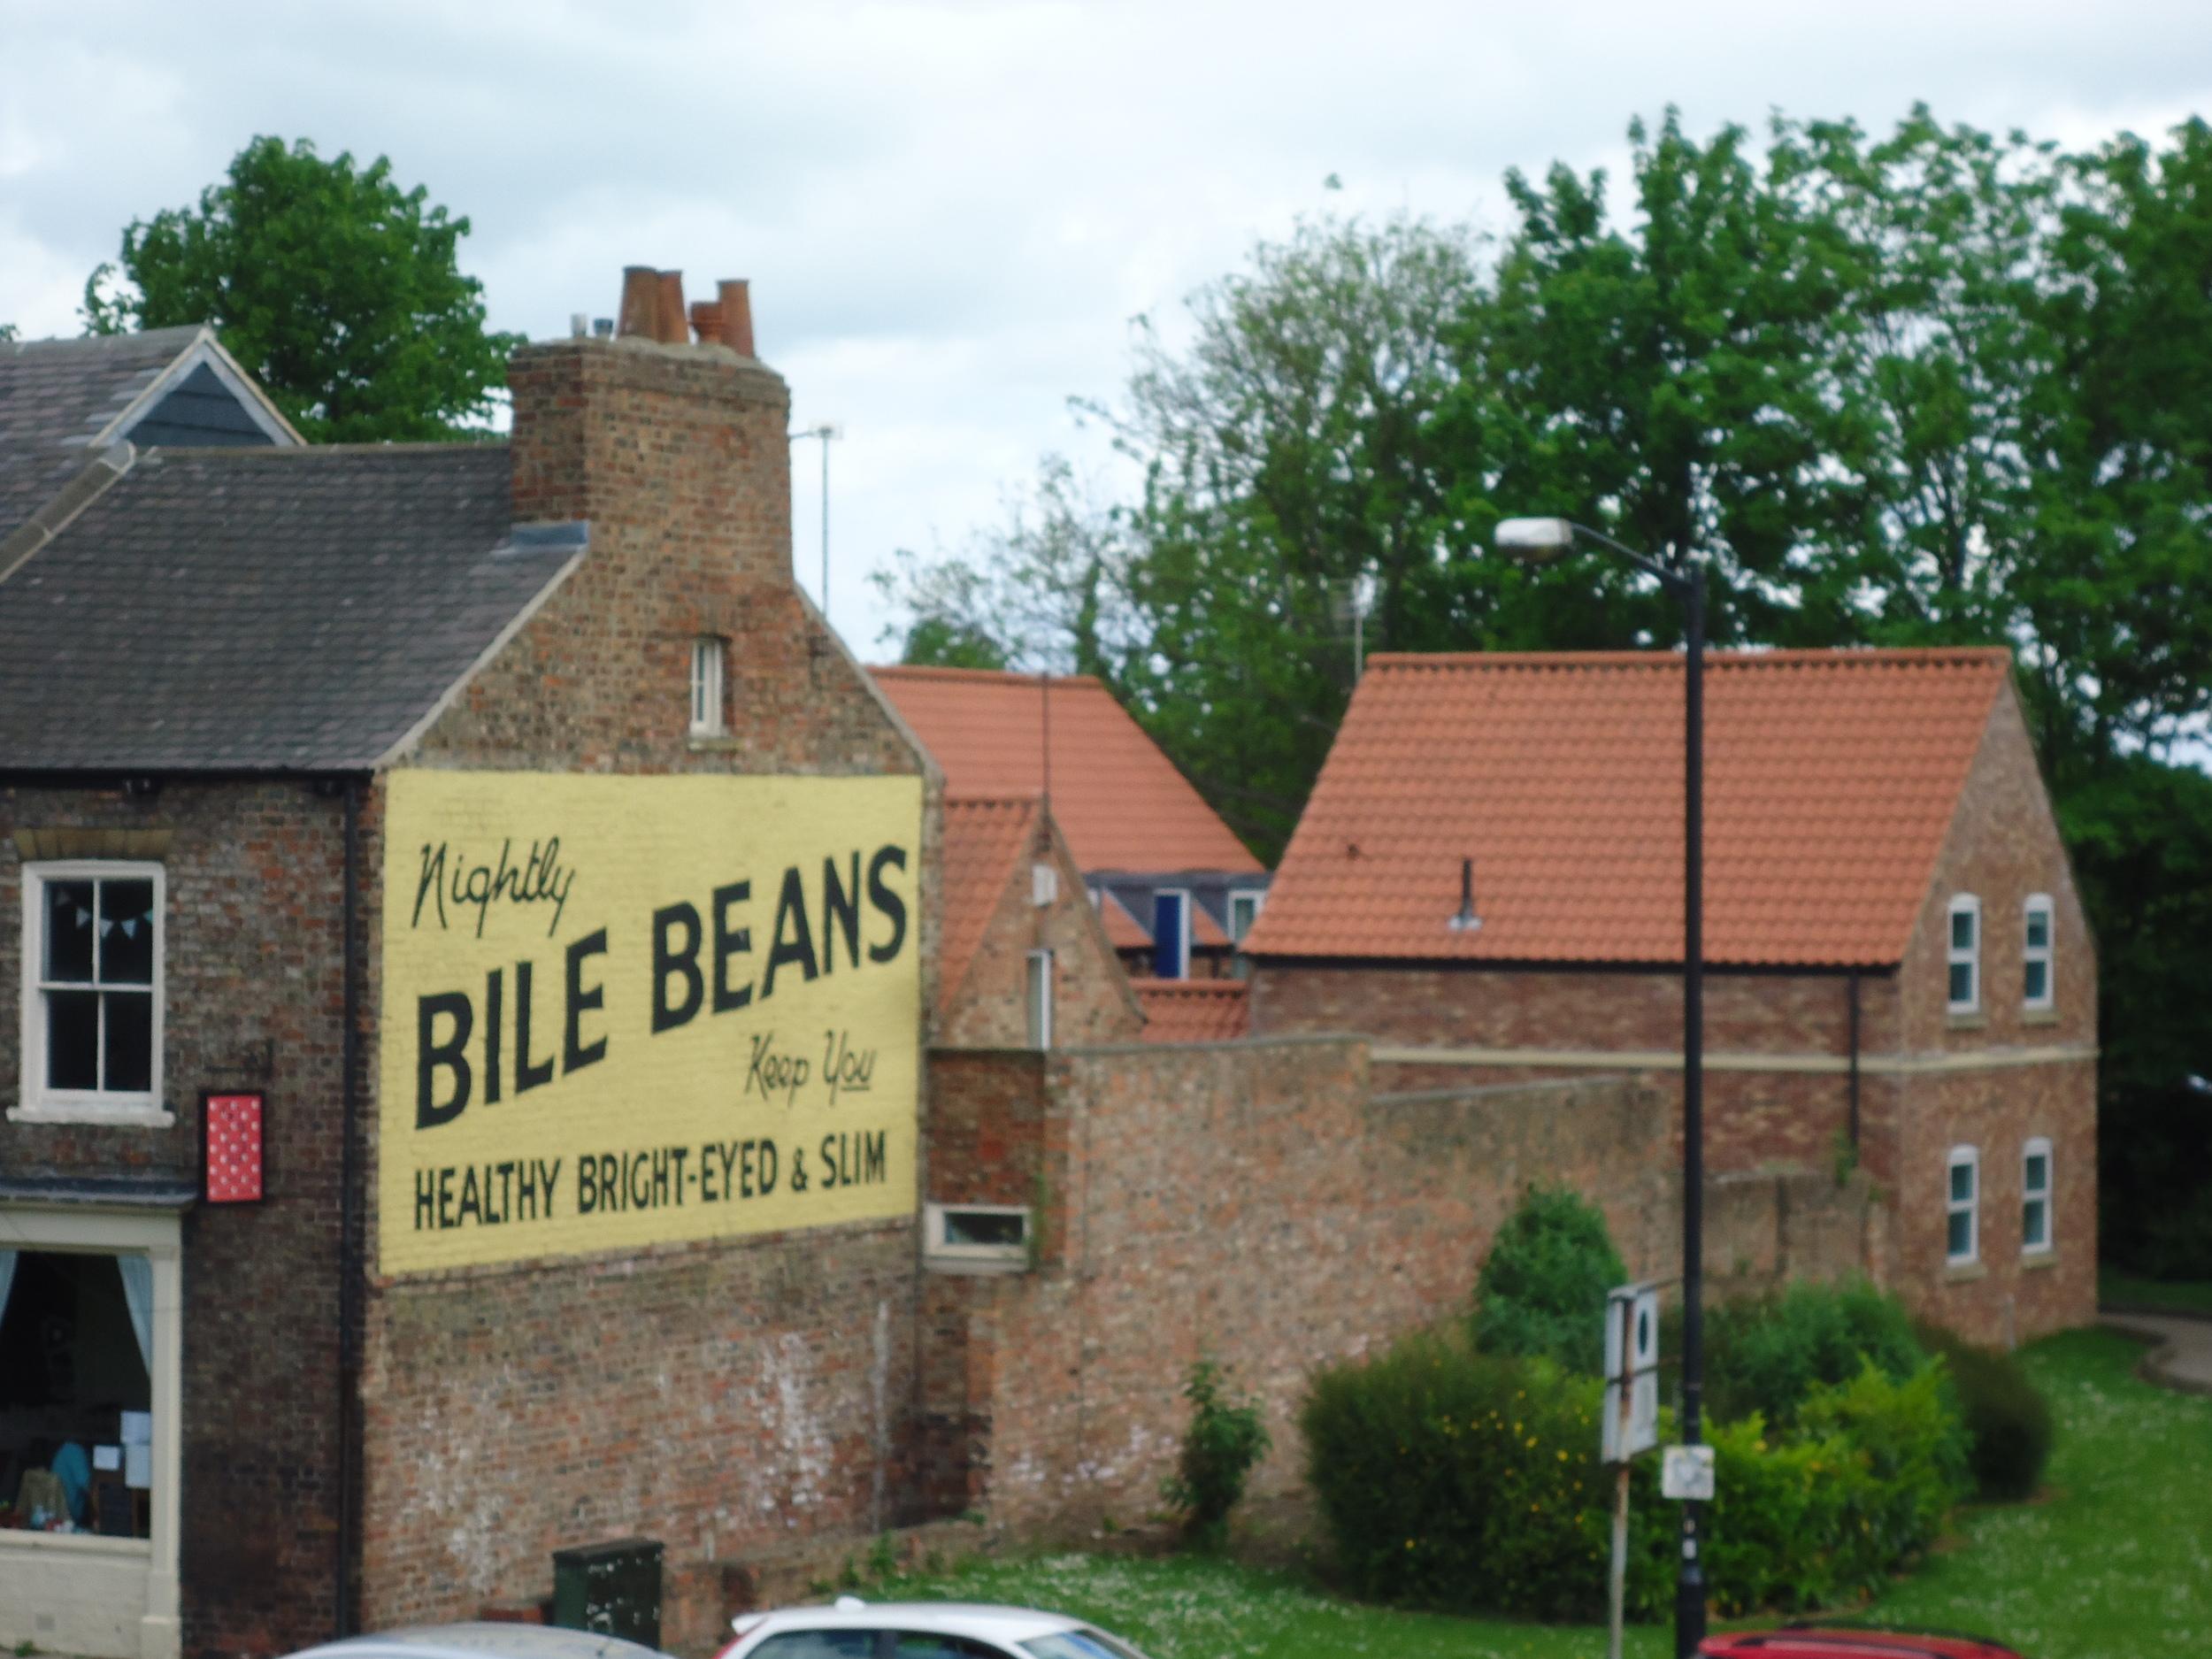 Bile Beans sign york england